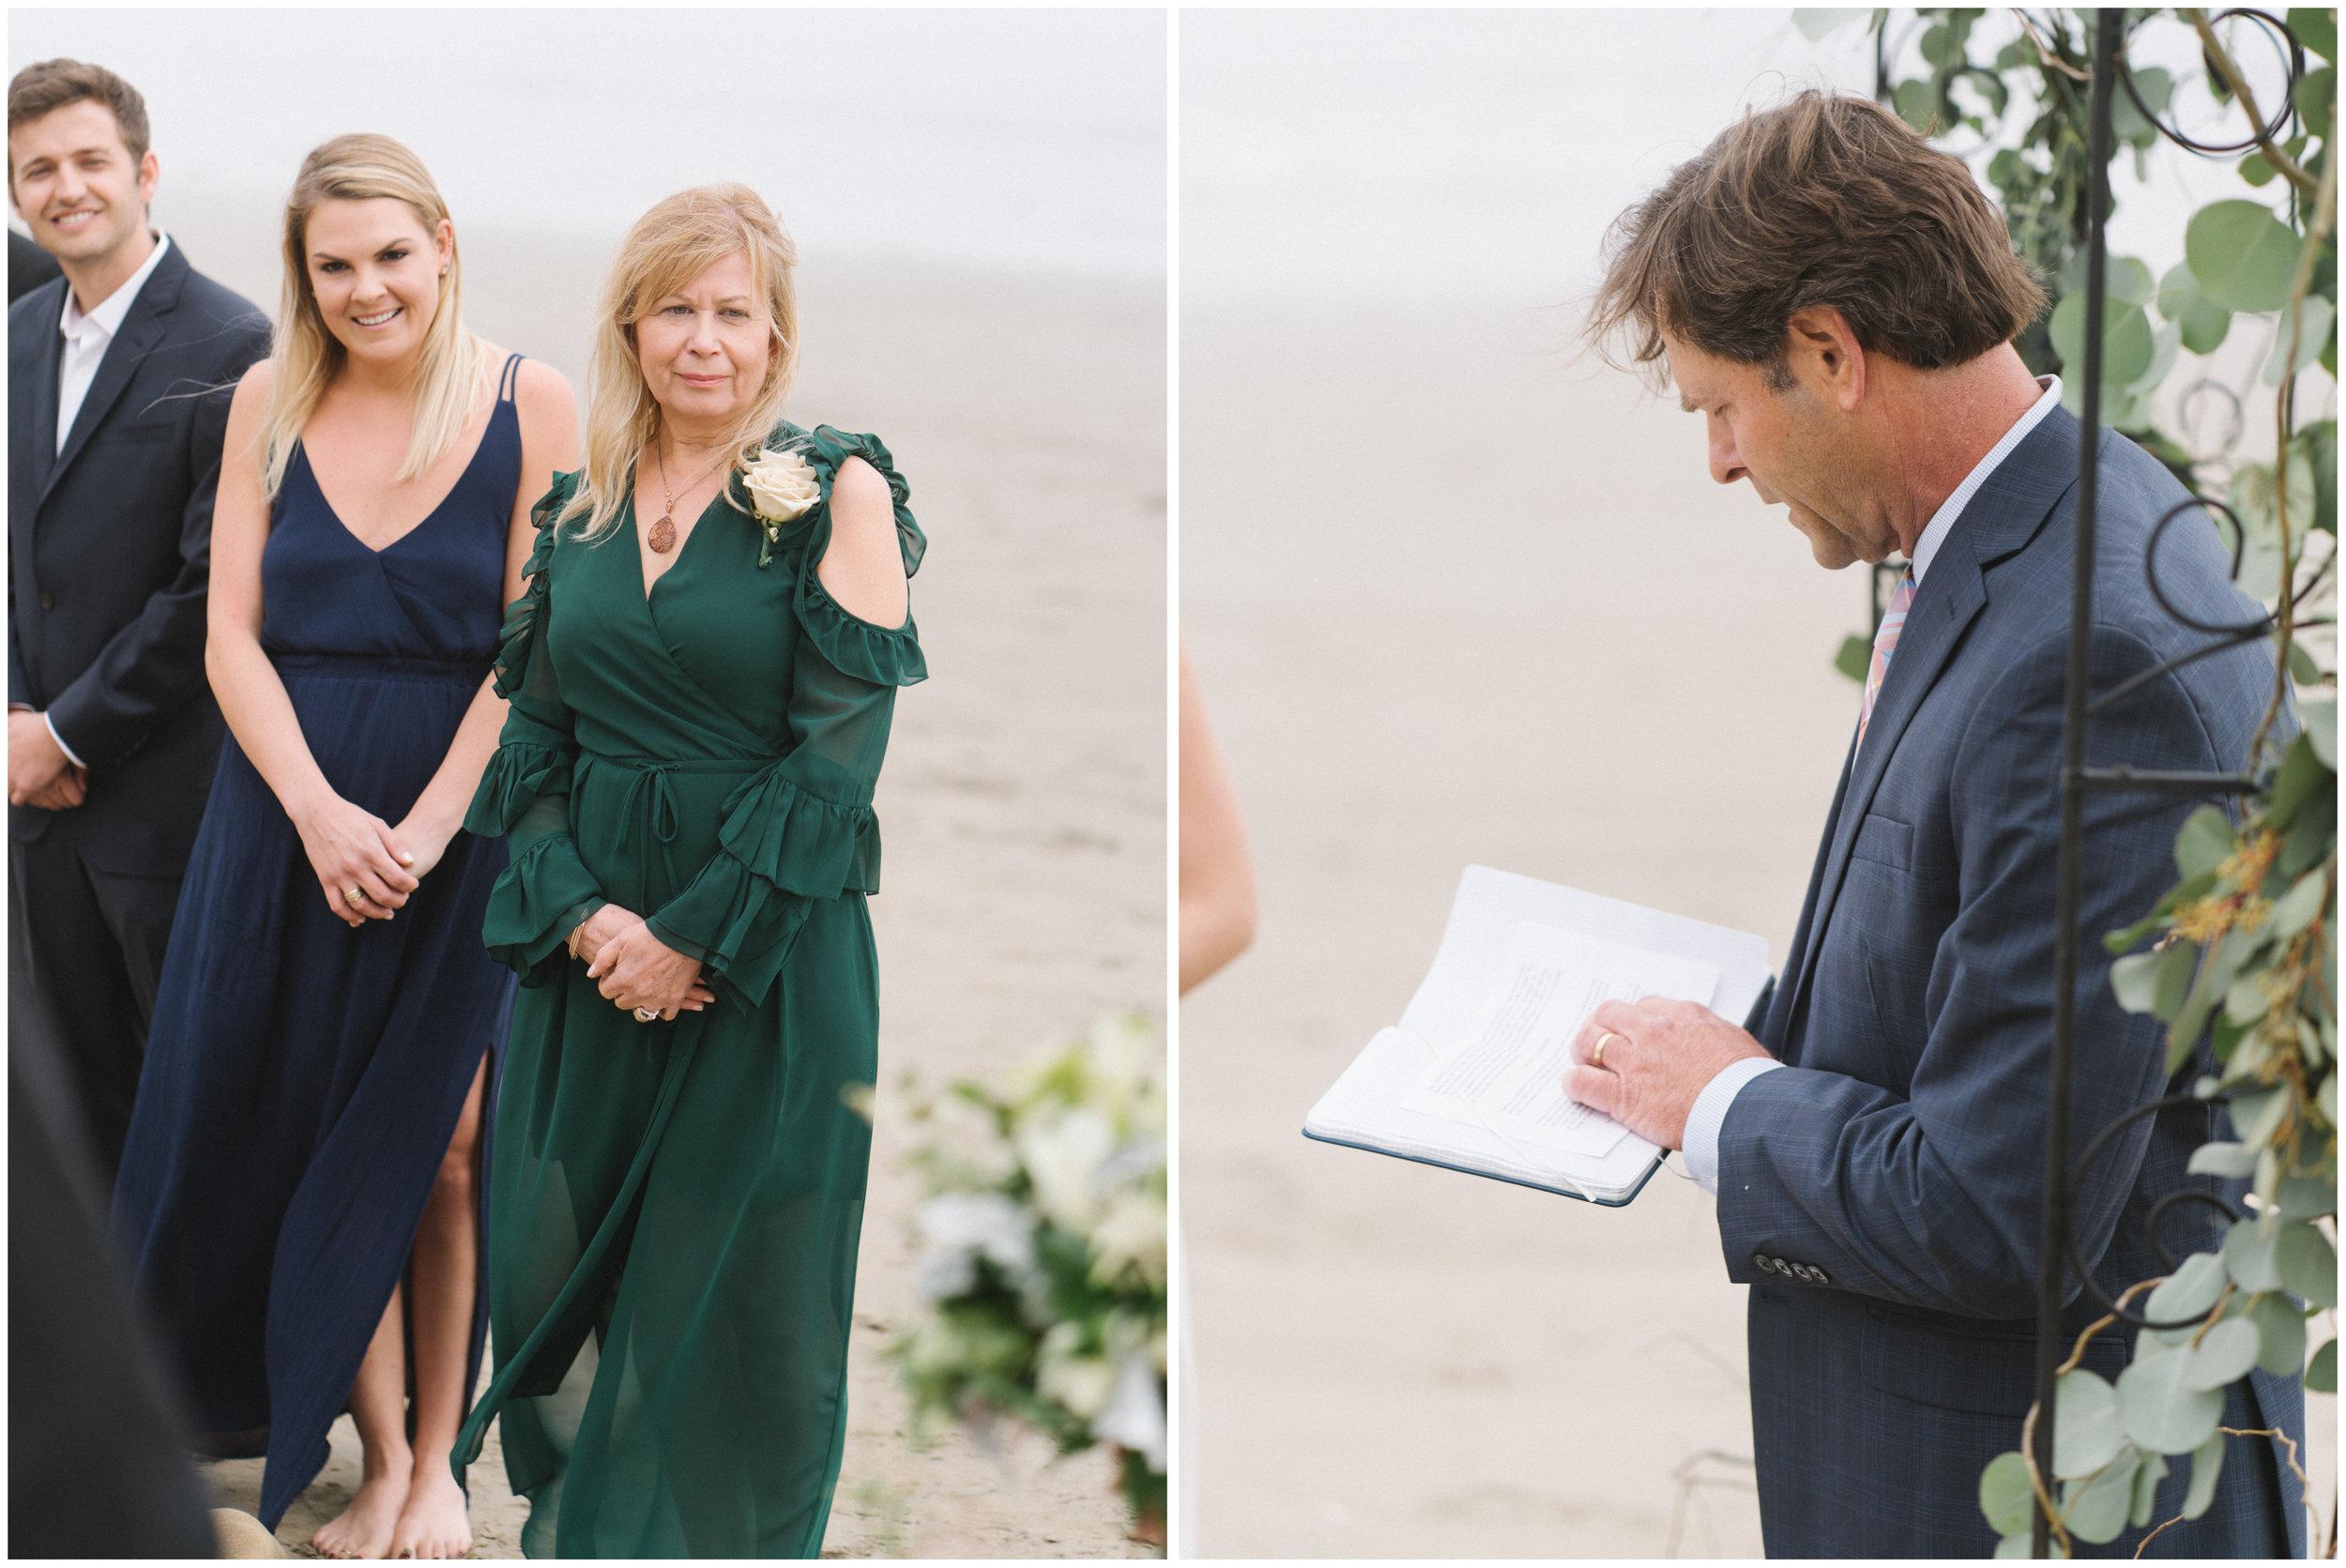 Santa Barbara Elopement Wedding Photographer - Pinnel Photography-07.jpg